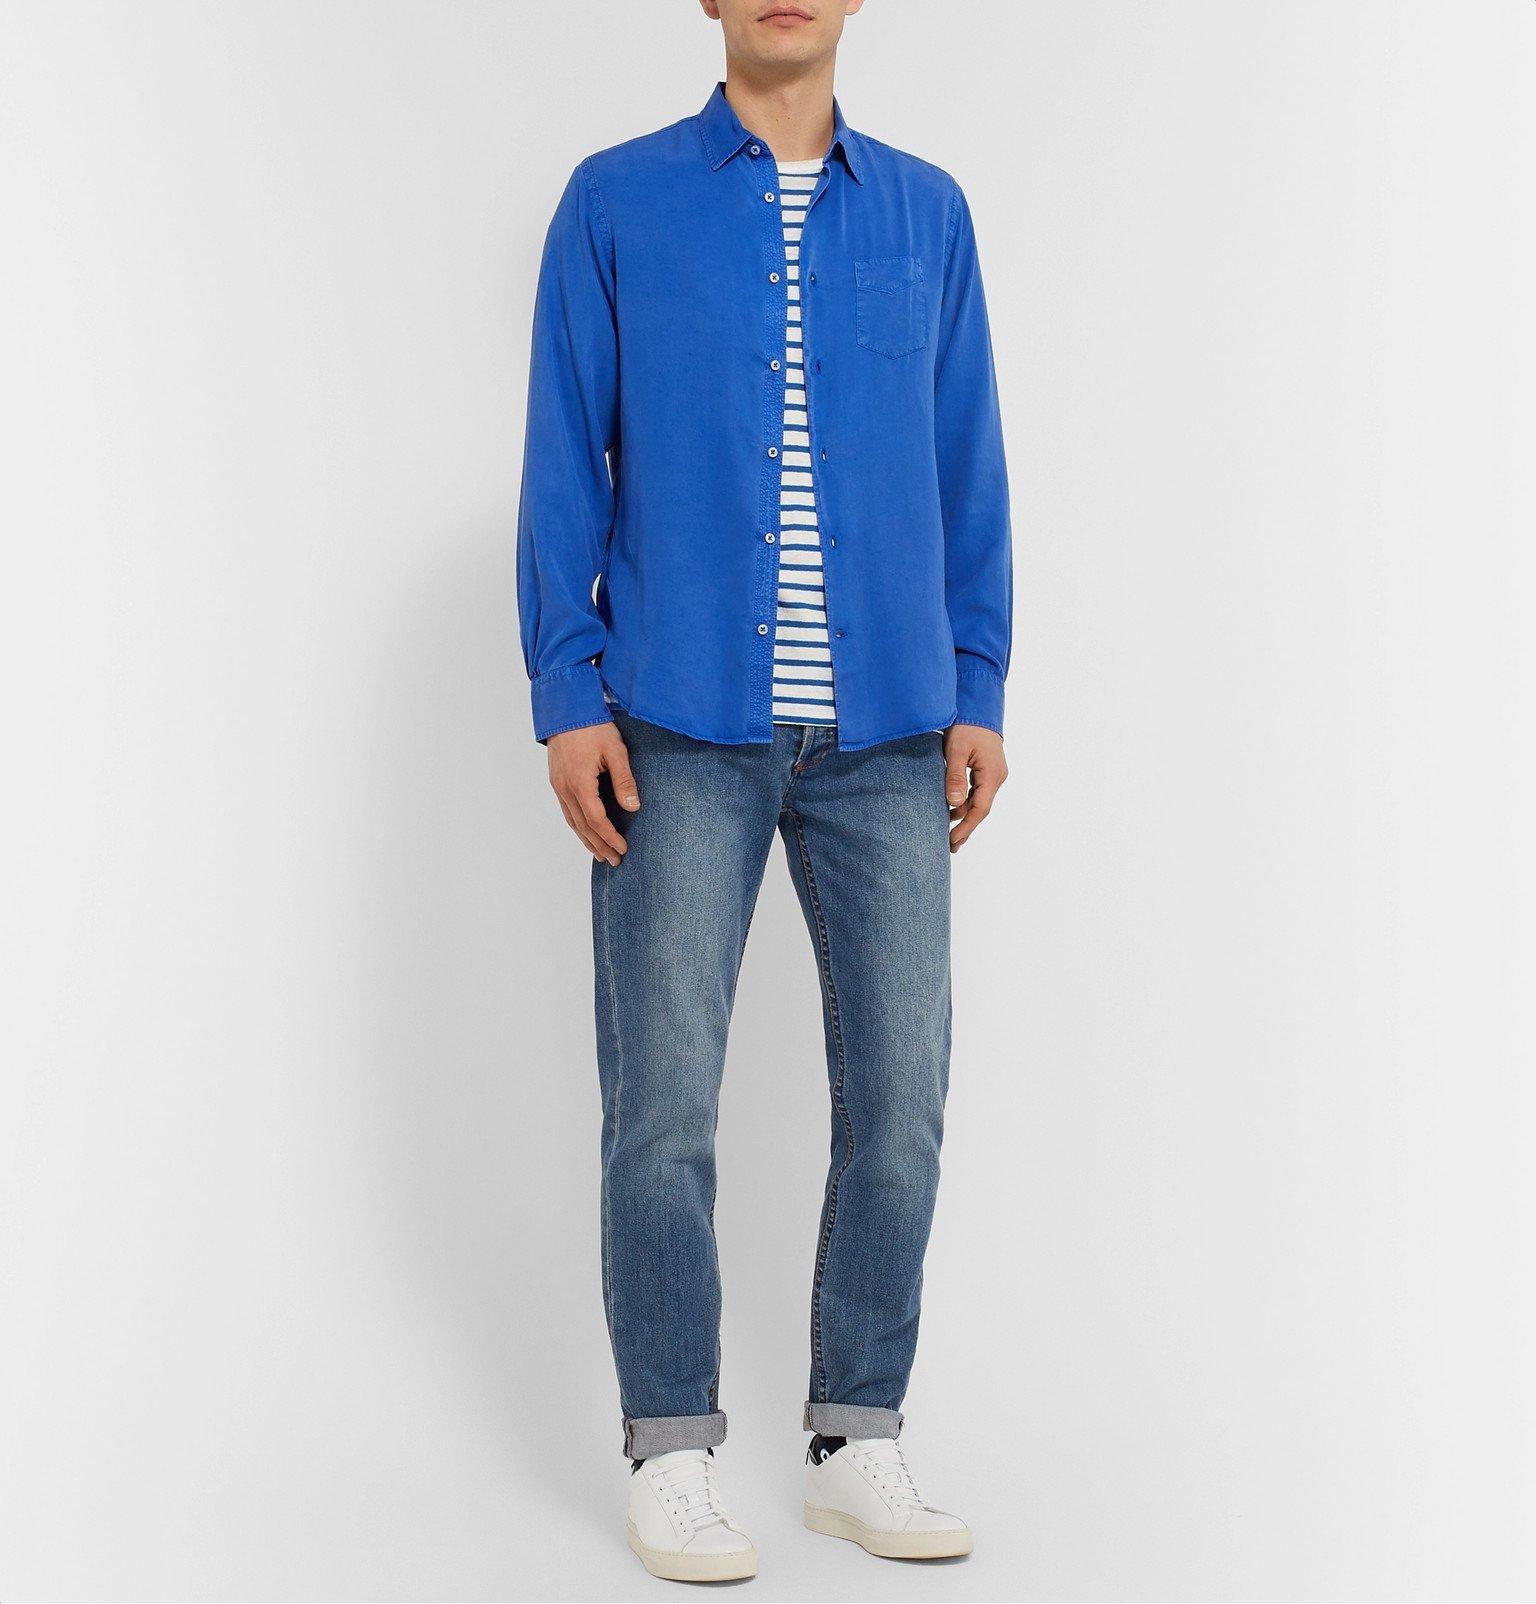 Officine Generale - Benoit Pigment-Dyed Lyocell Shirt - Blue